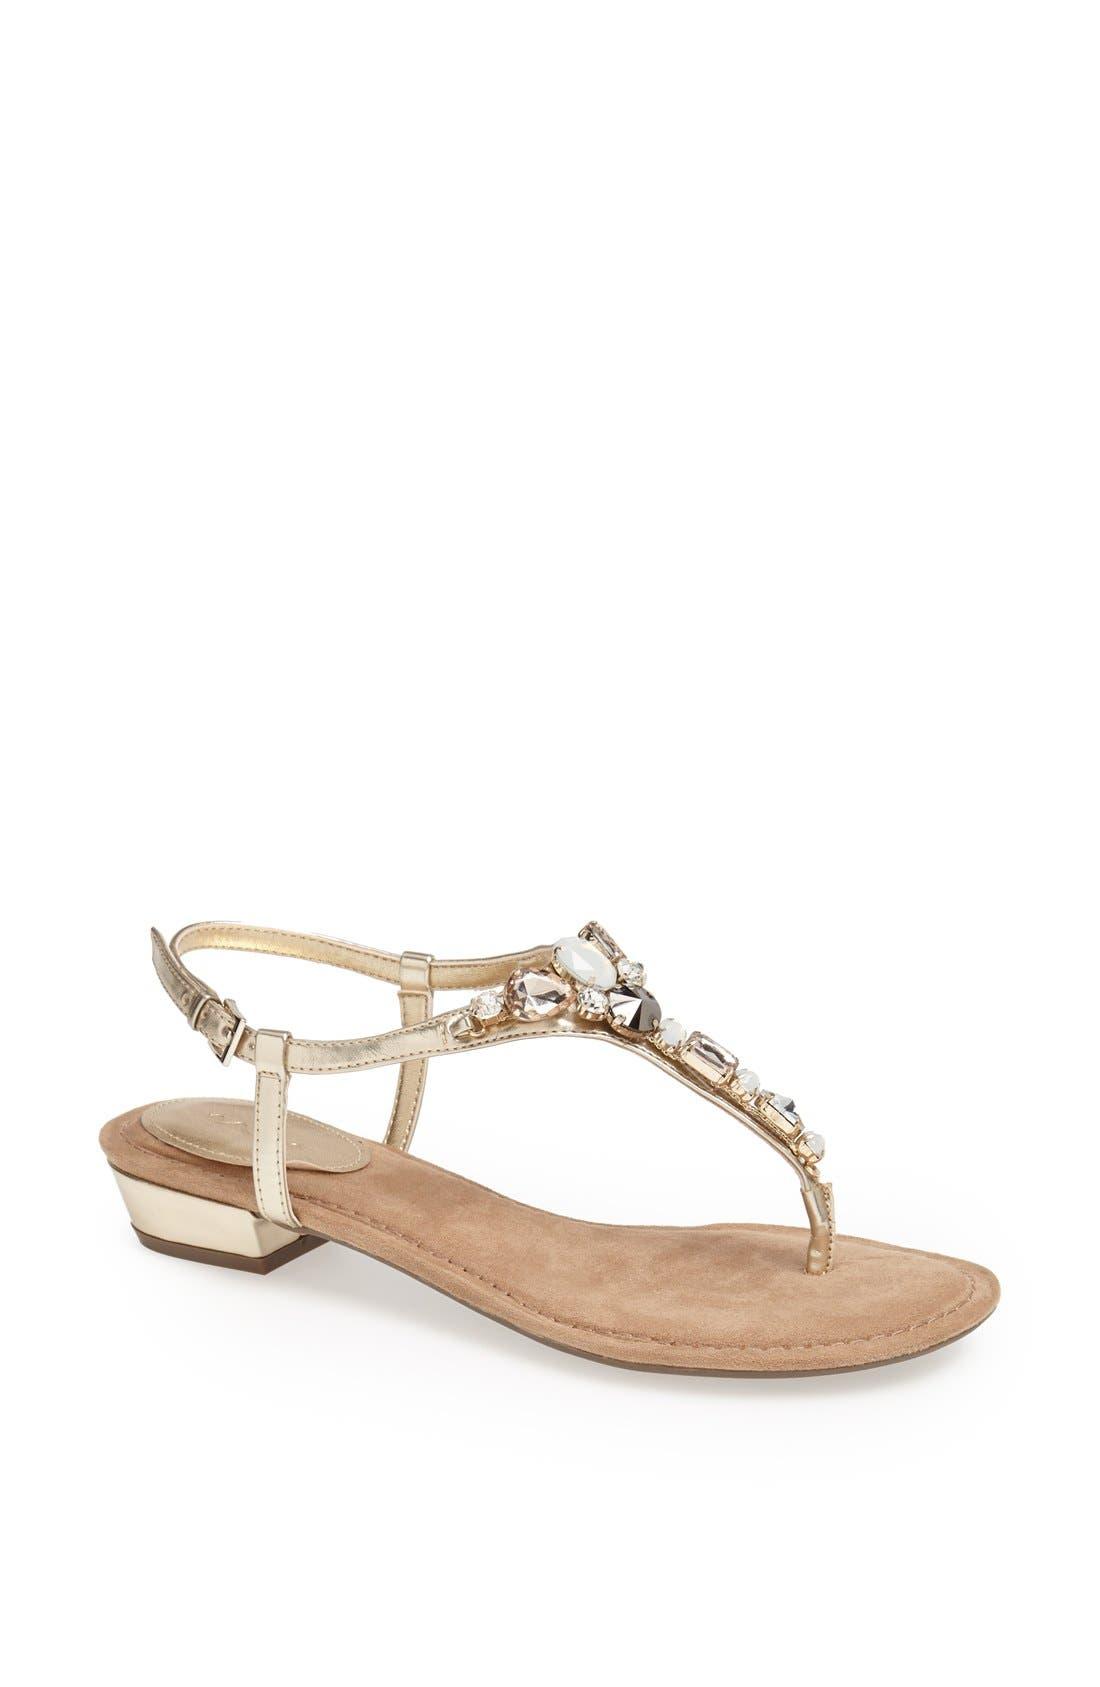 Alternate Image 1 Selected - Nina 'Kelisha' Sandal